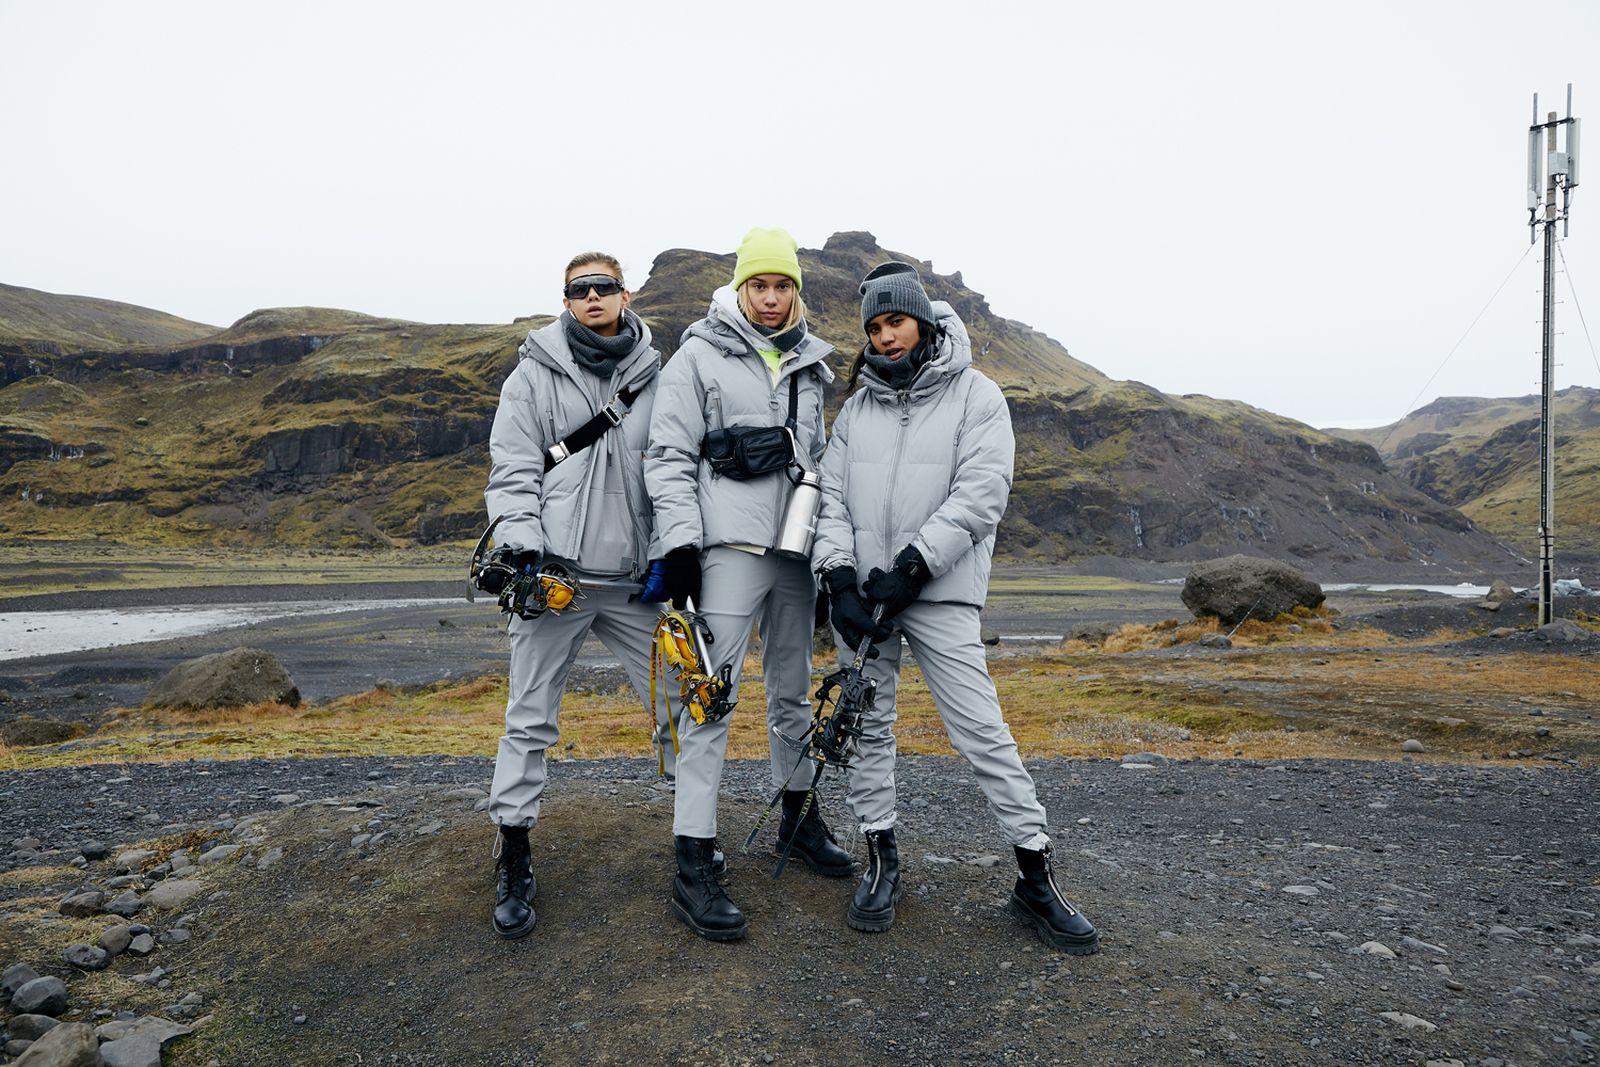 highsnobiety-the-arrivals-collaboration-lookbook-01